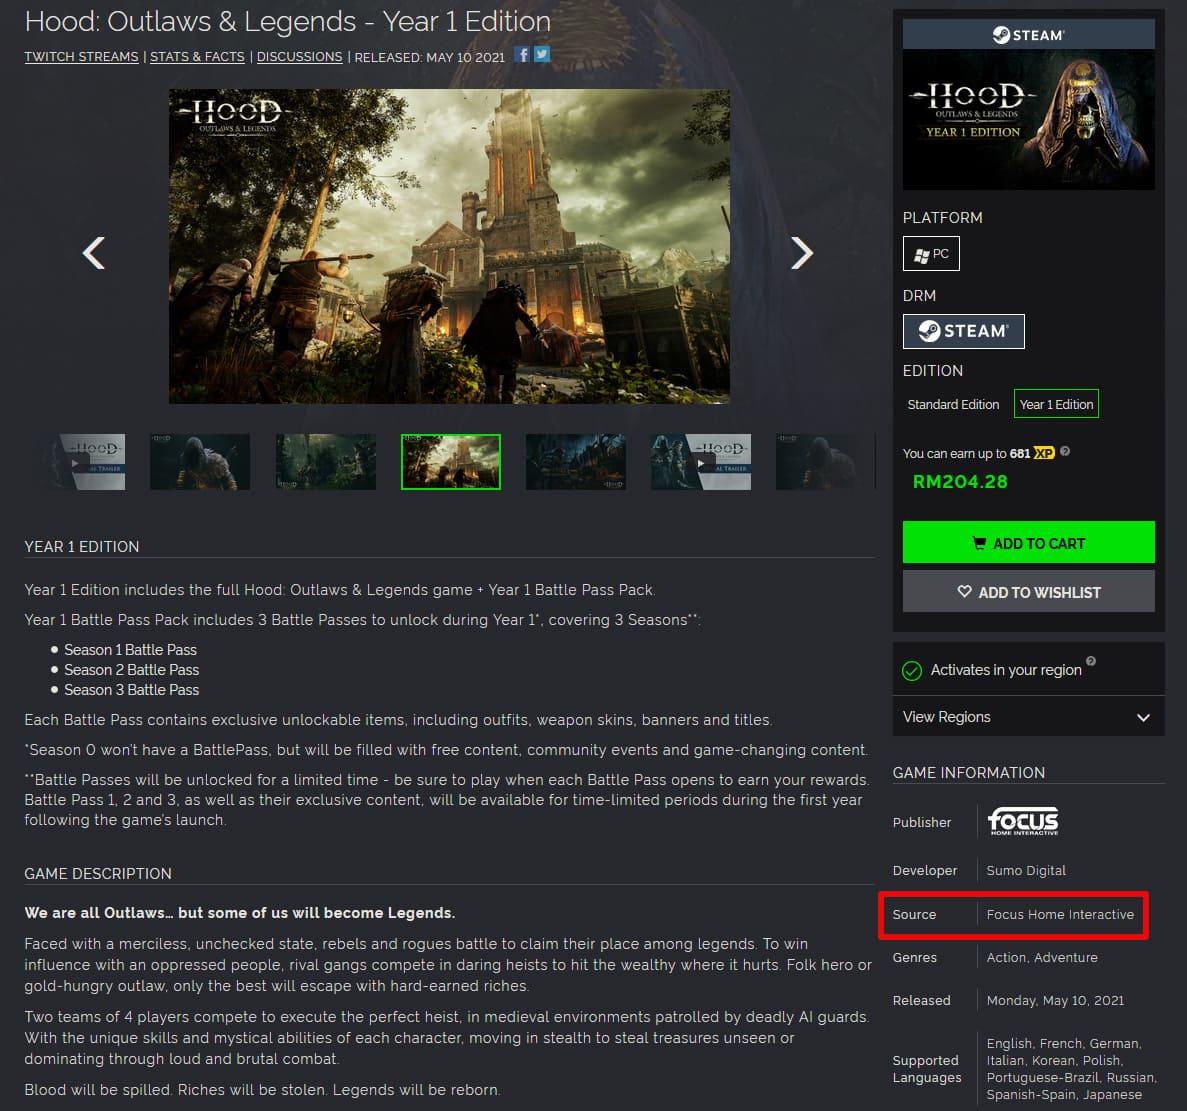 gmg game key source